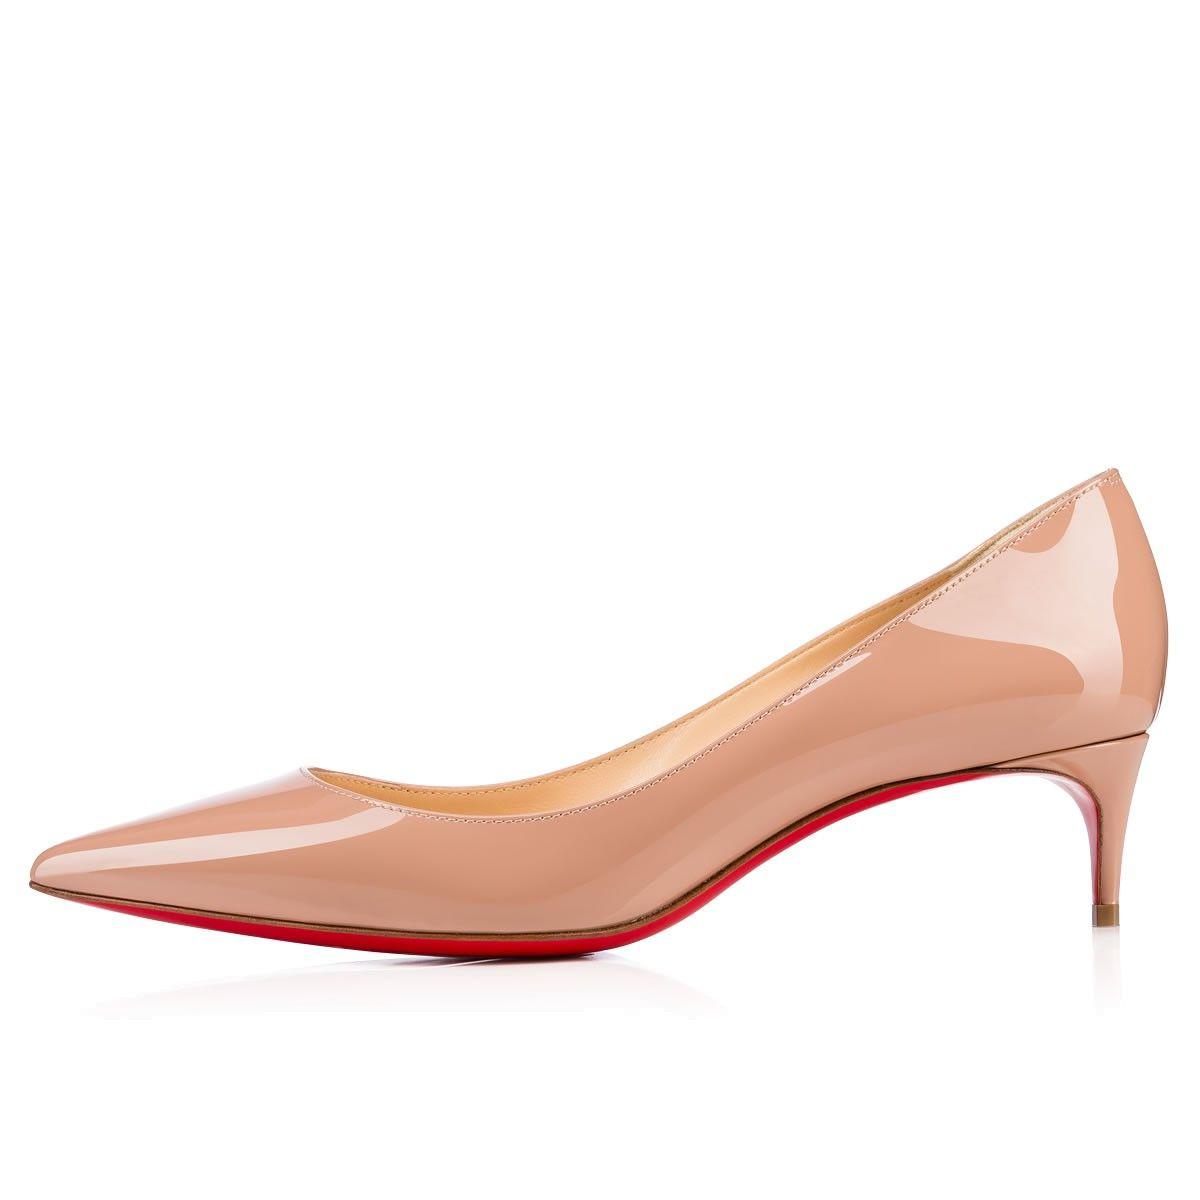 Woman shoes - Decollete 554 Varnish - Christian Louboutin